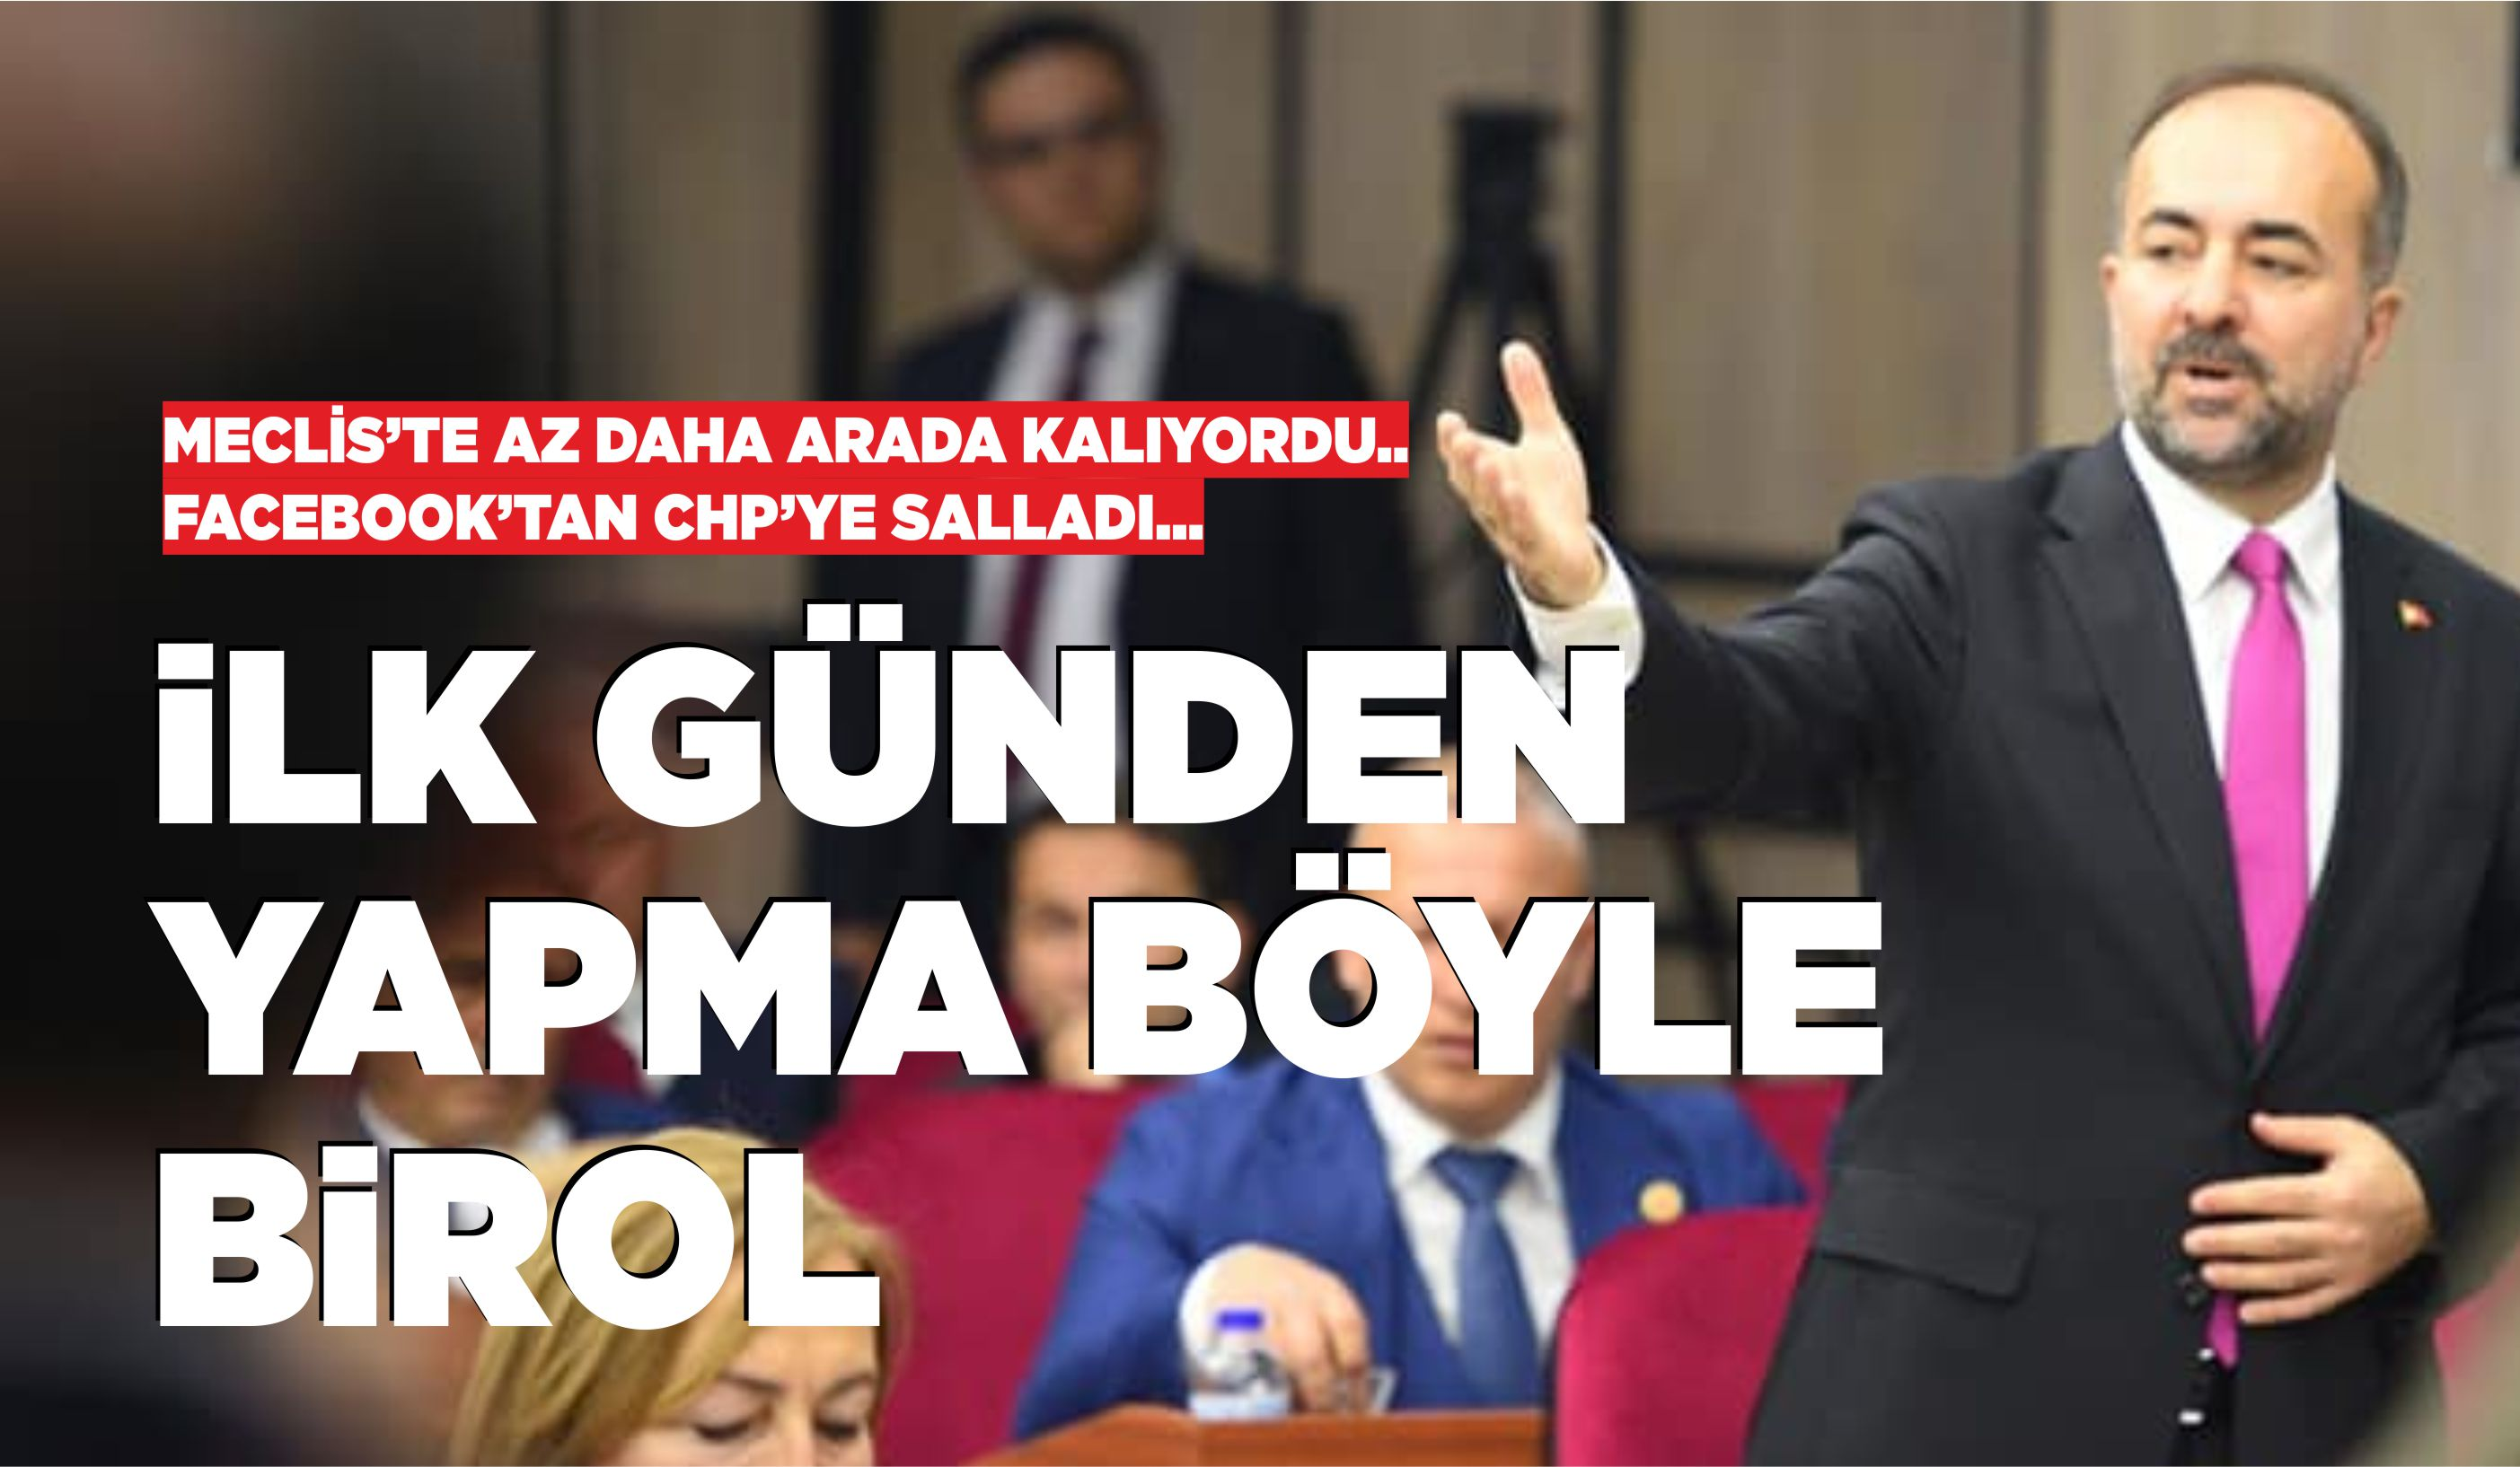 MECLİS'TE AZ DAHA ARADA KALIYORDU, FACEBOOK'TAN KÜKREDİ!